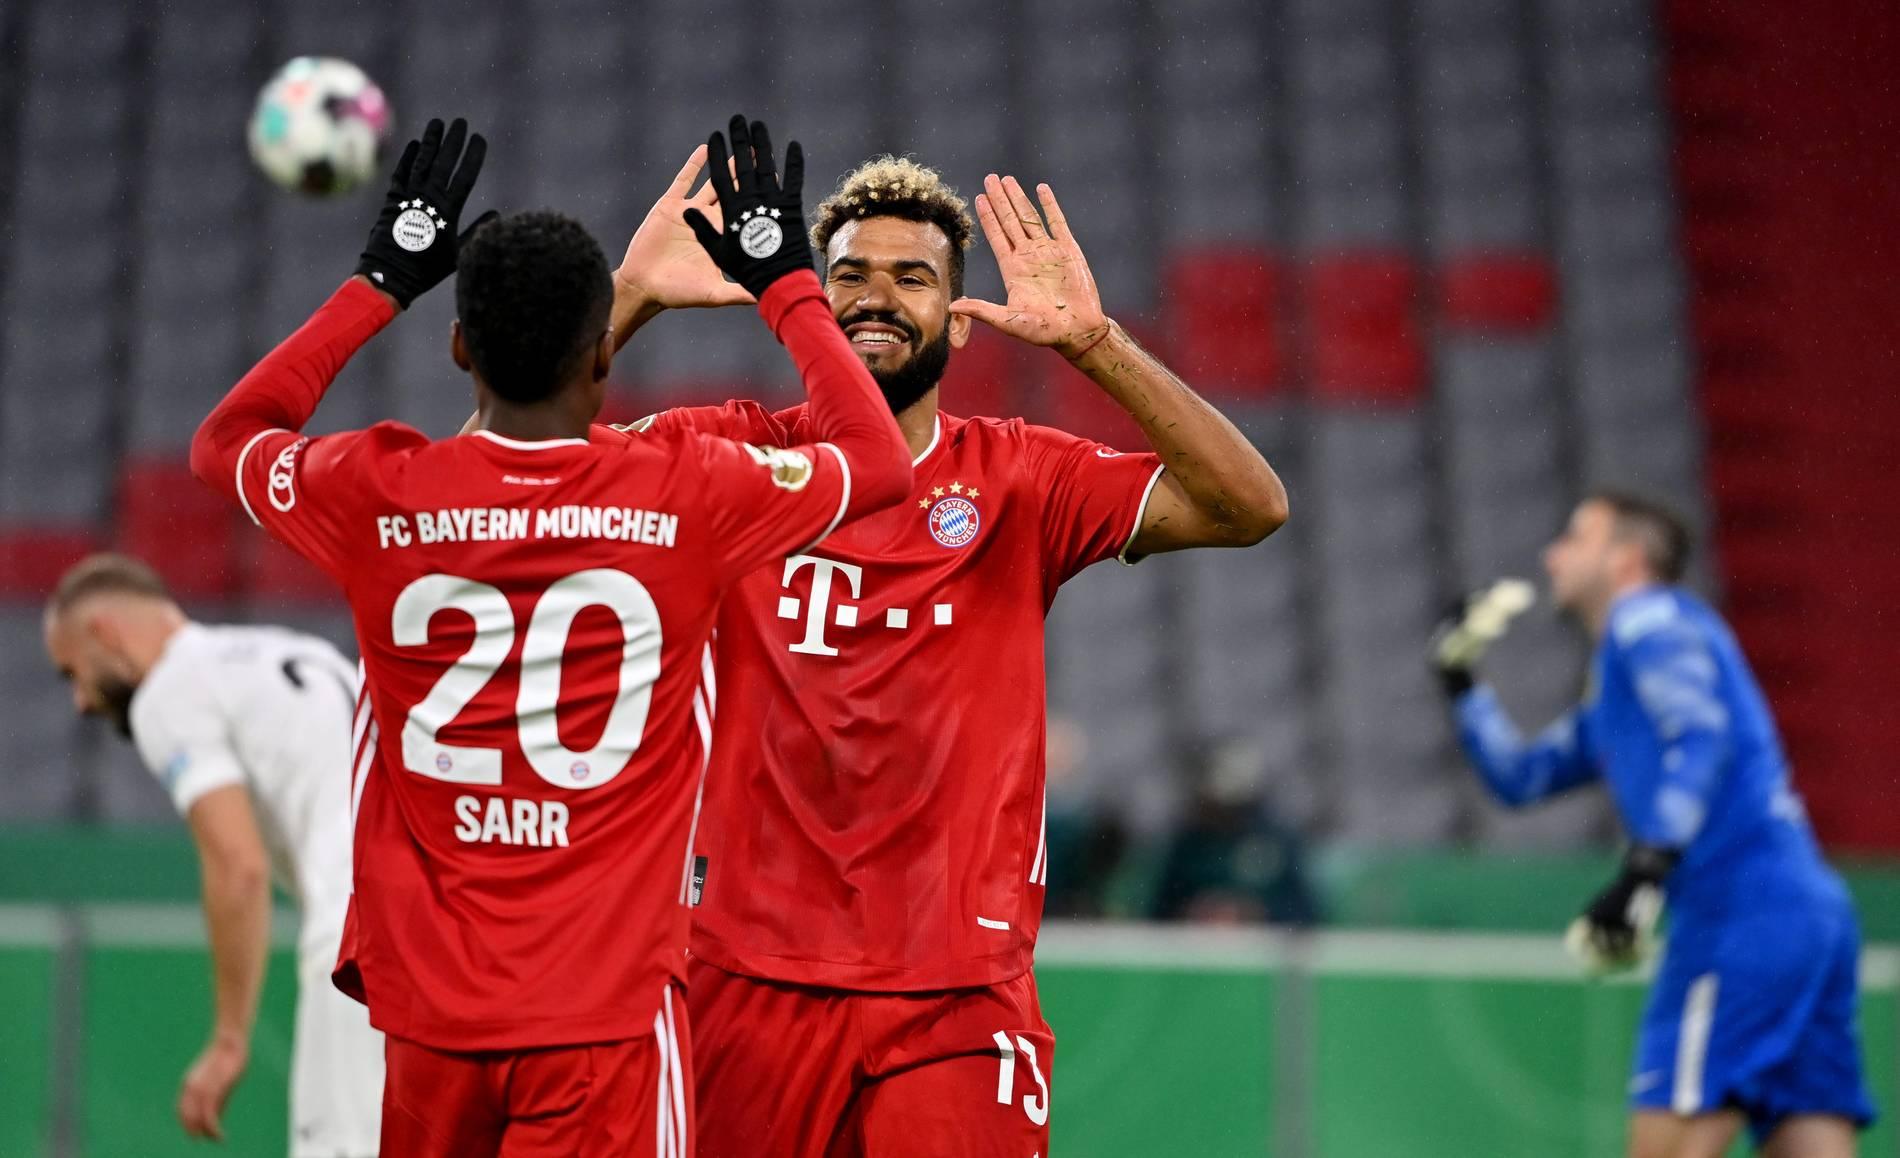 FC Bayern im Pokal gegen Fünftligist Düren mit Debütanten